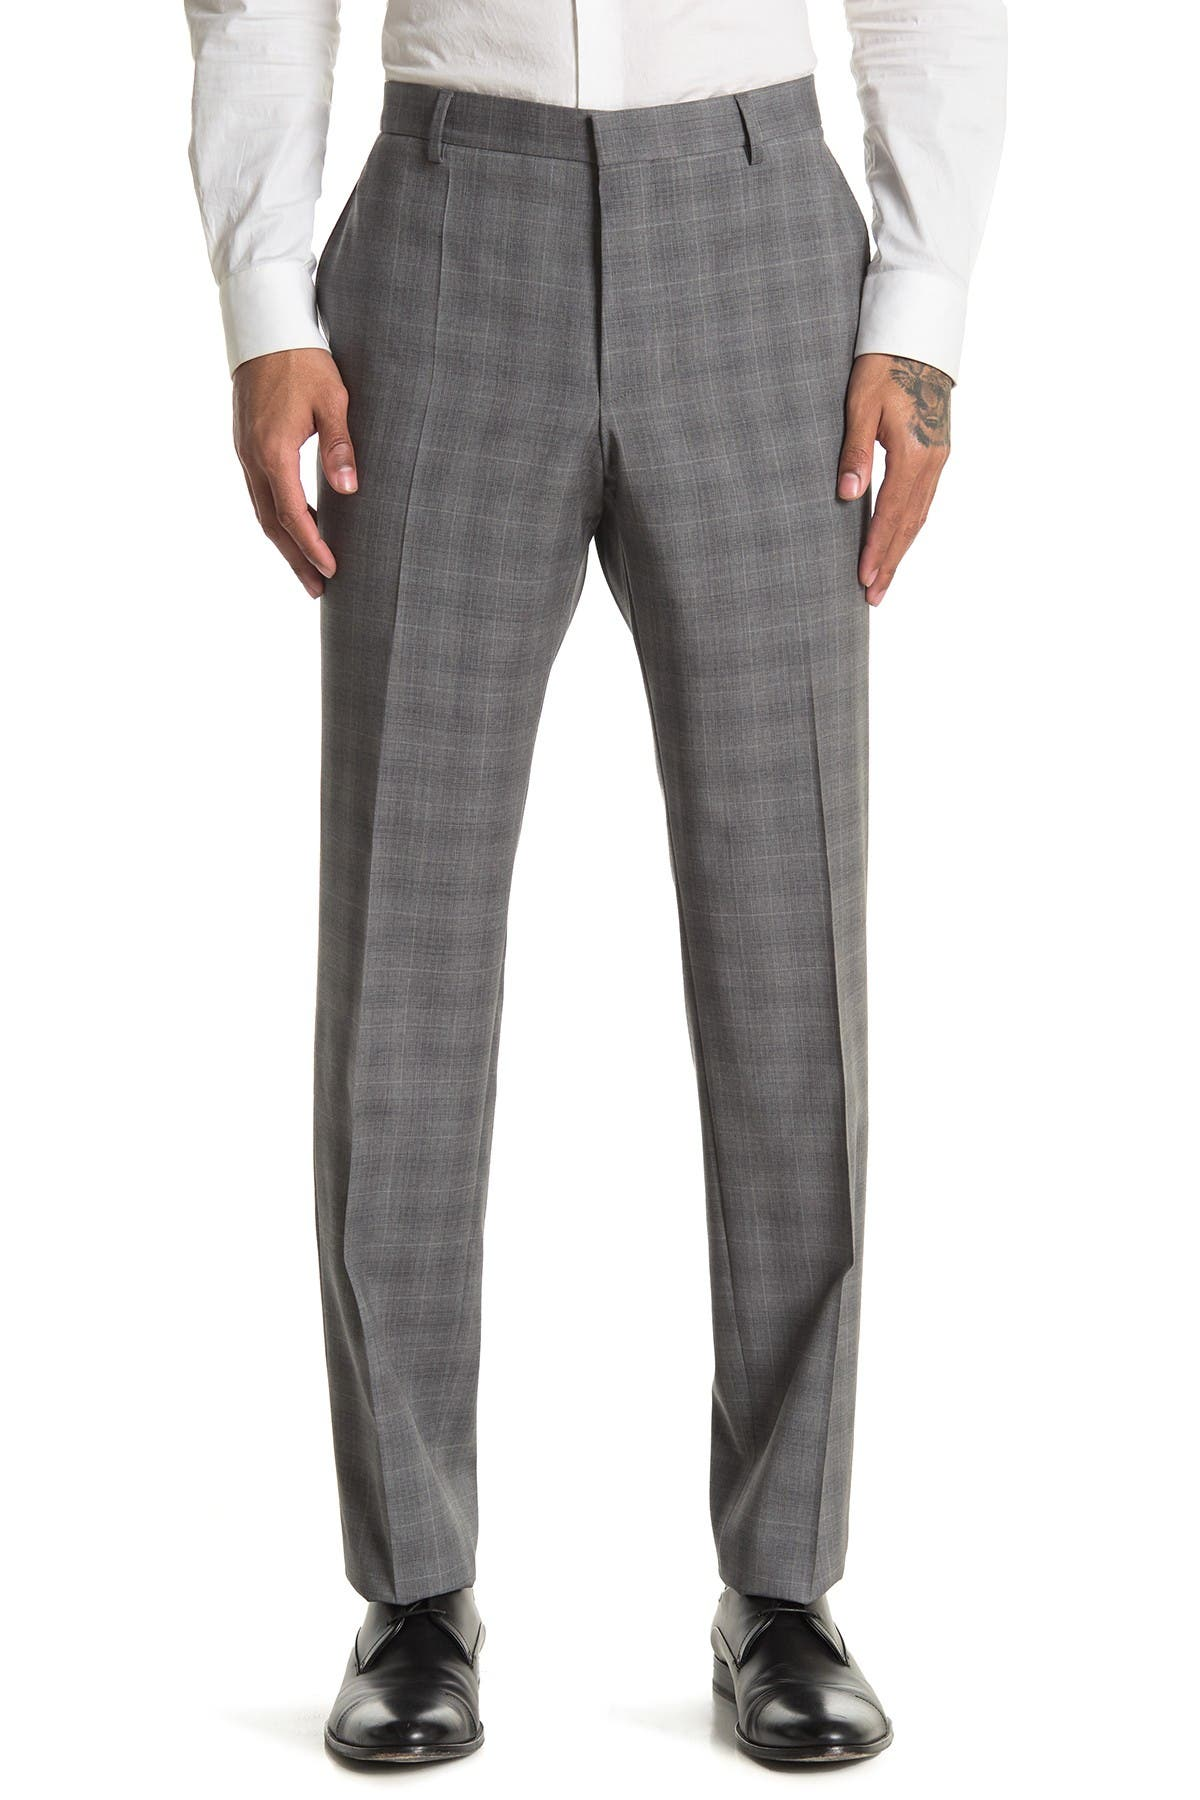 Image of BOSS Grey Plaid Wool Pants